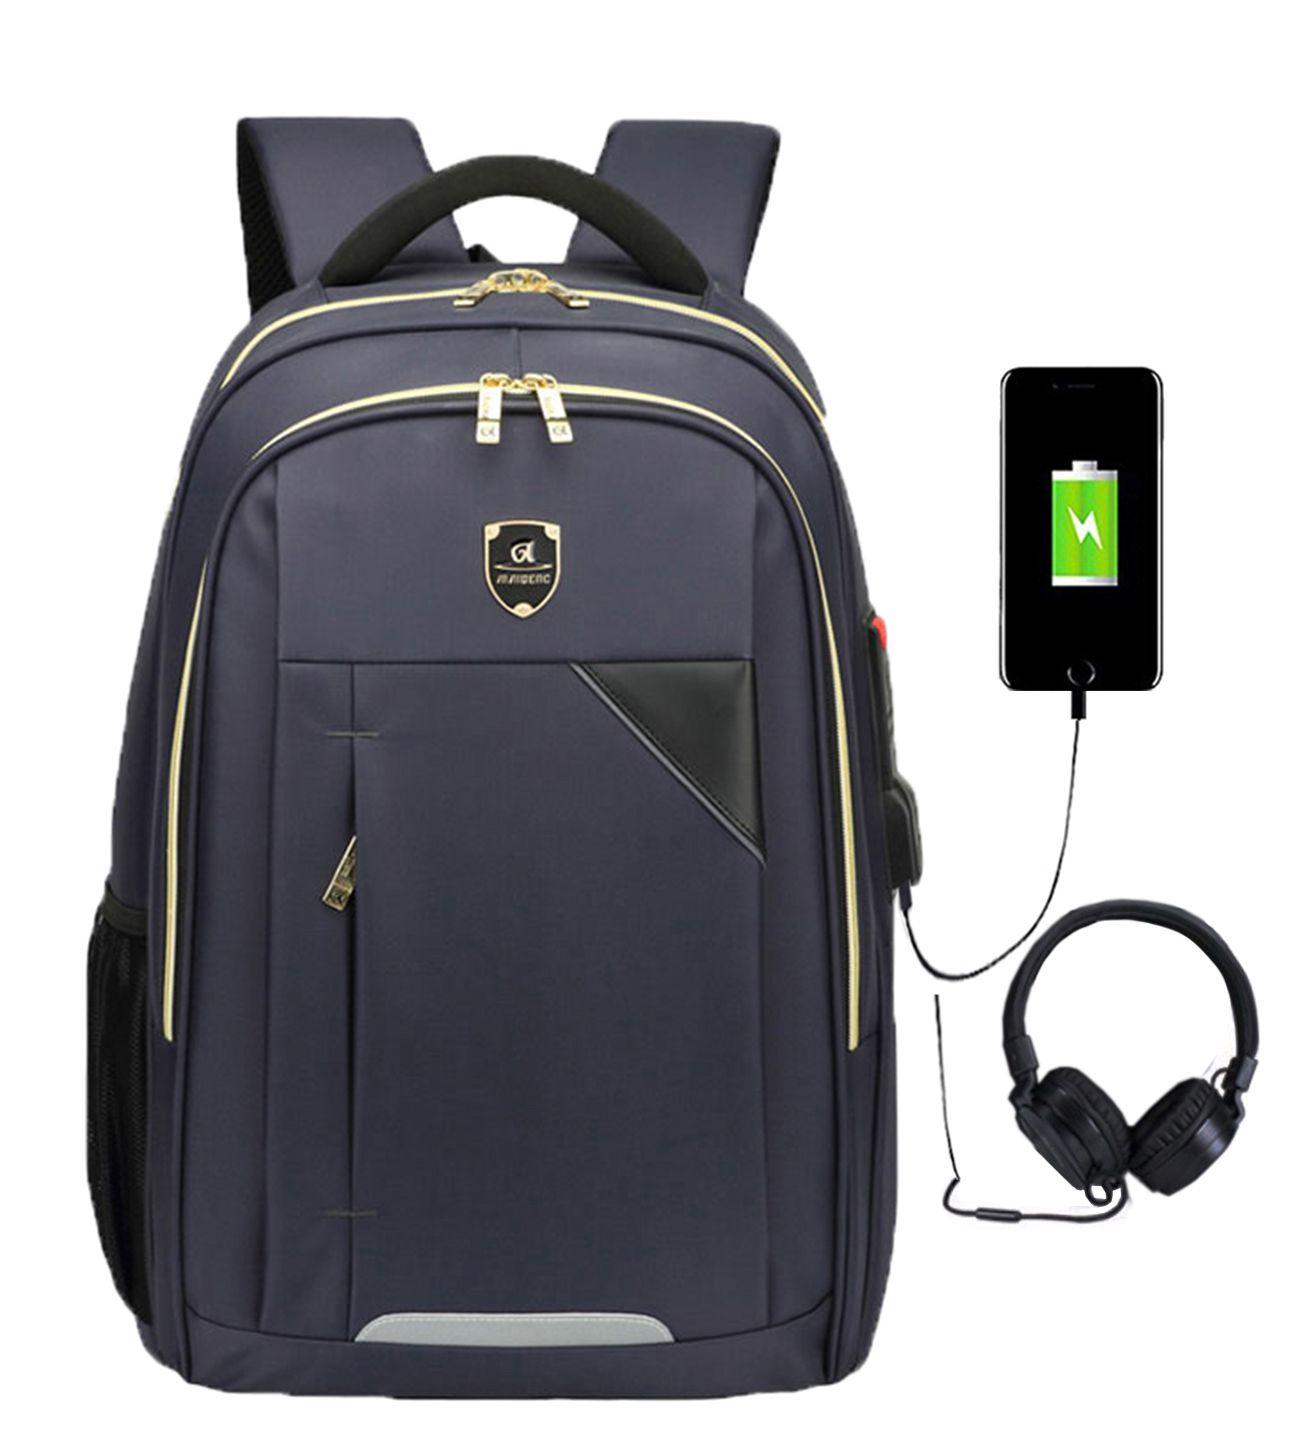 Mochila Escolar Impermeável Saída USB Fone 1802 Azul Top